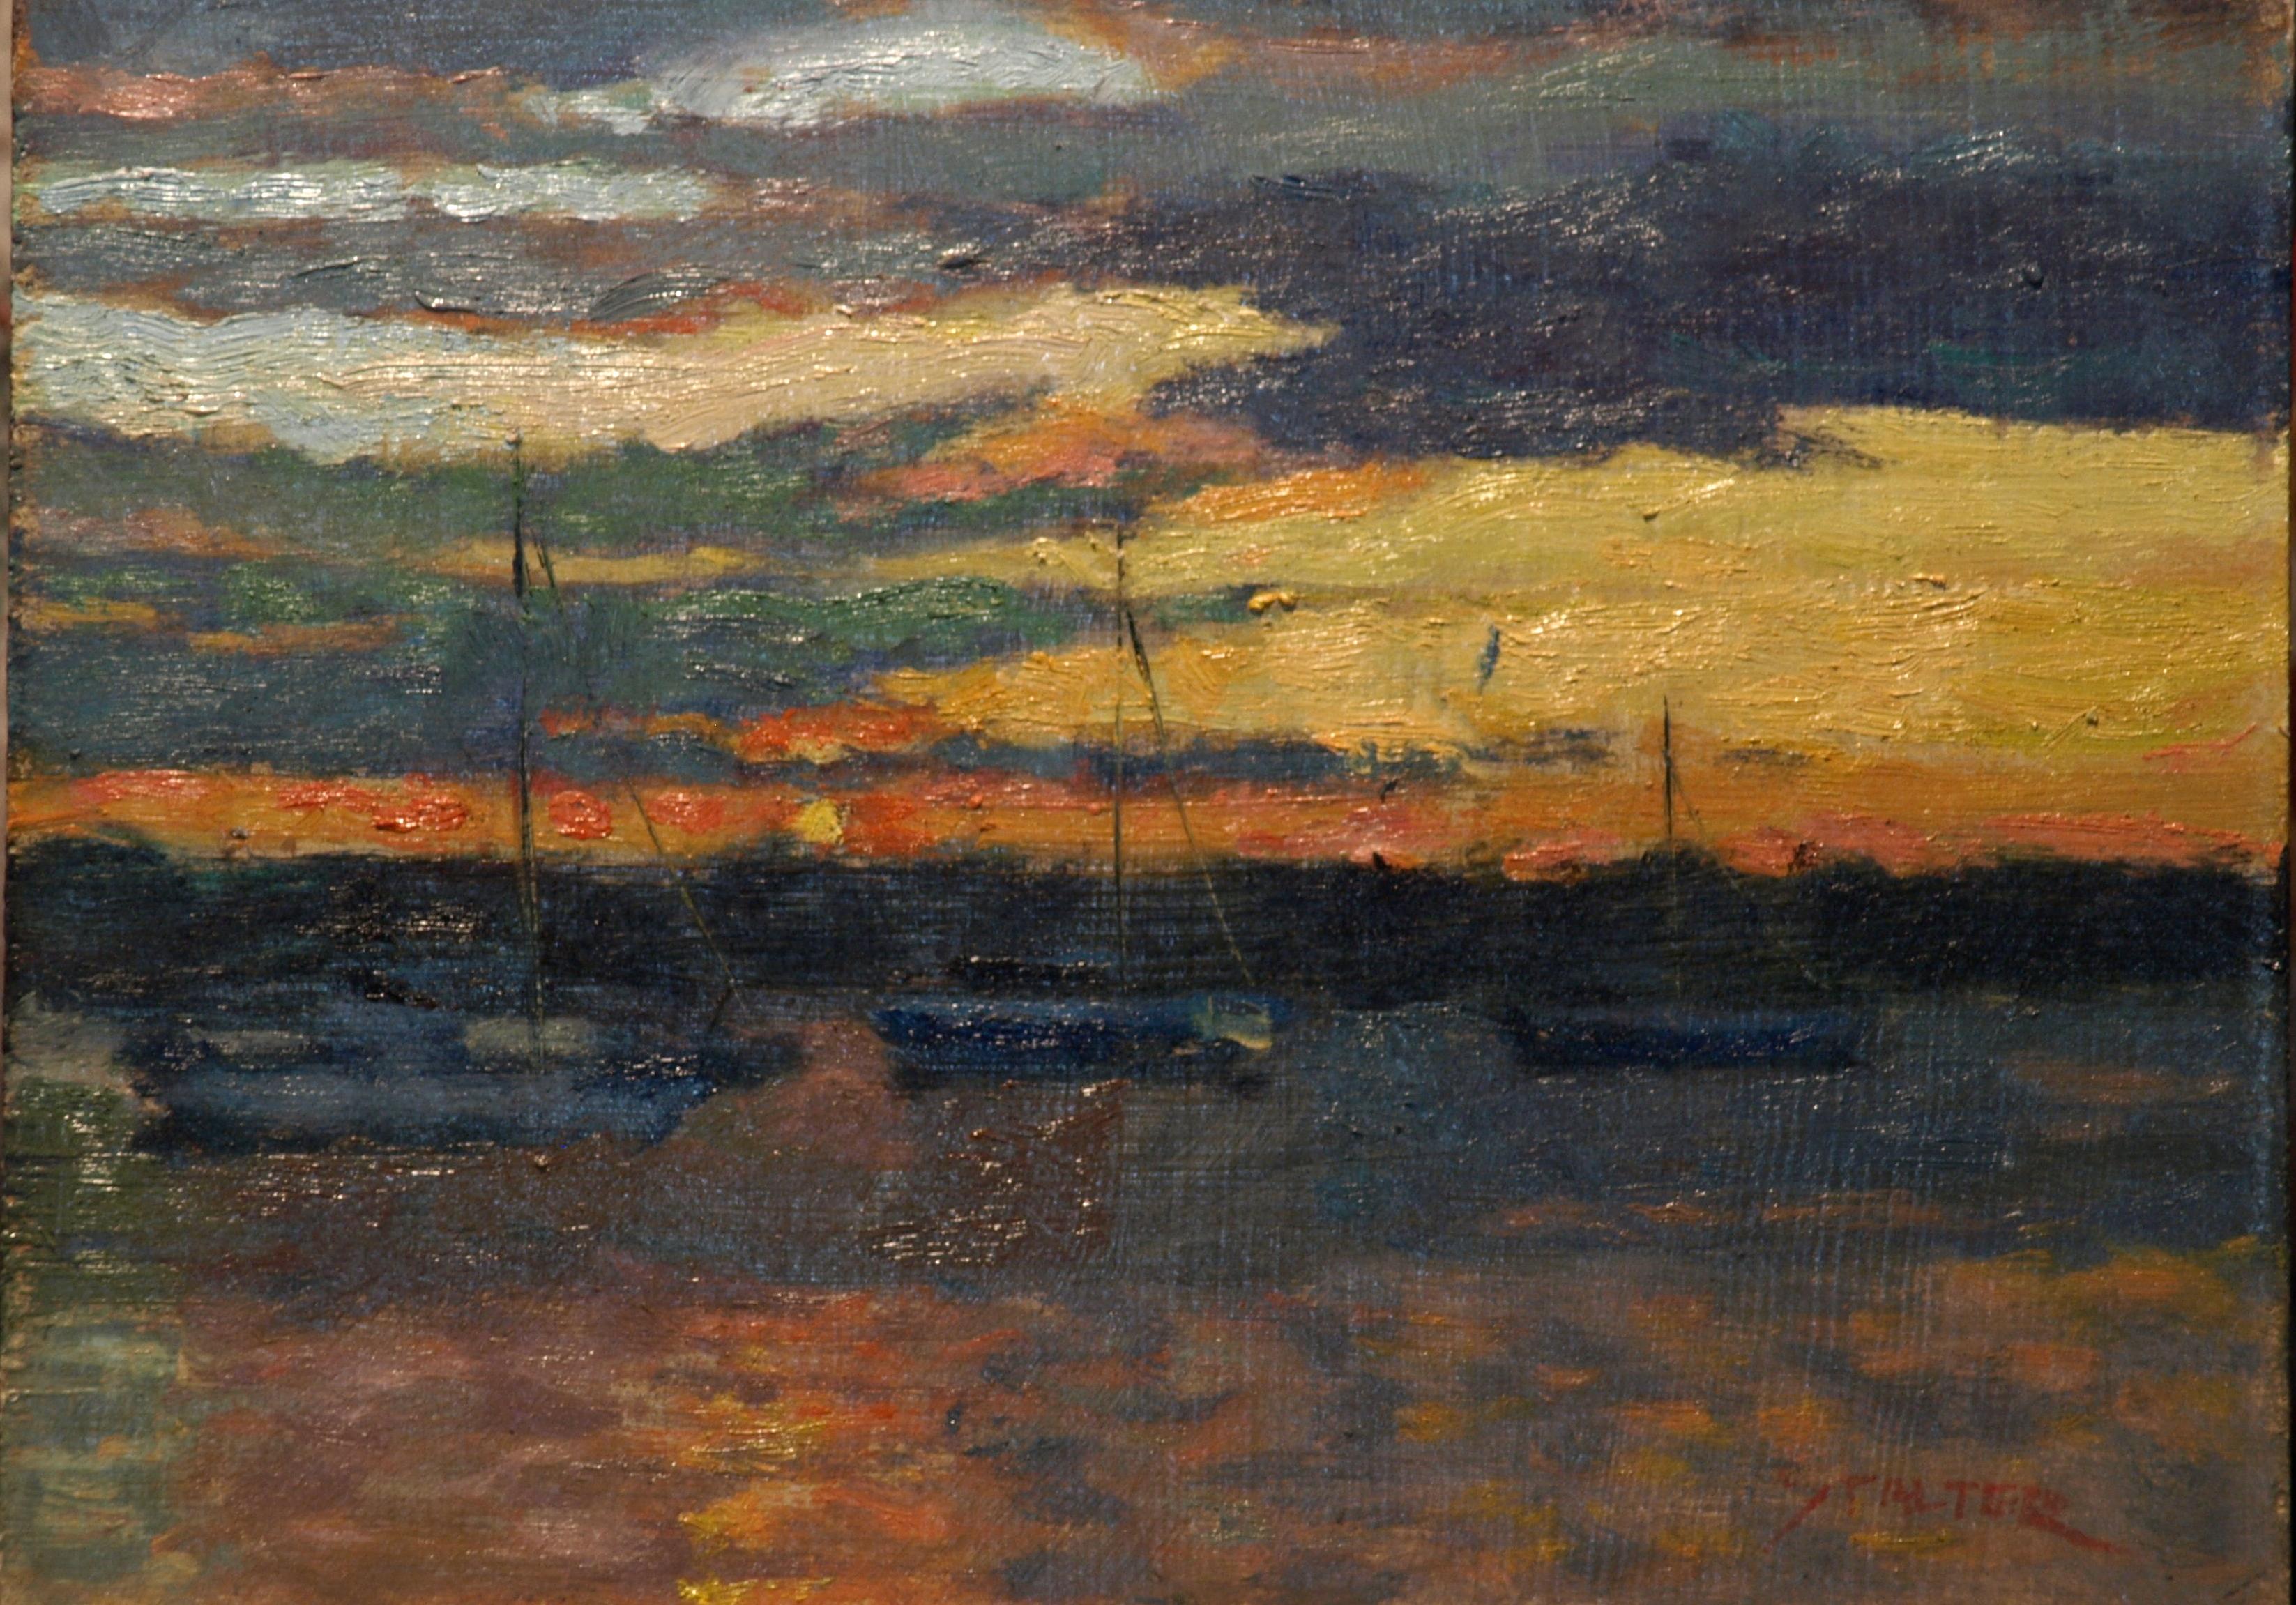 Sunset -- Stonington Harbor, Oil on Canvas on Panel, 9 x 12 Inches, by Richard Stalter, $225